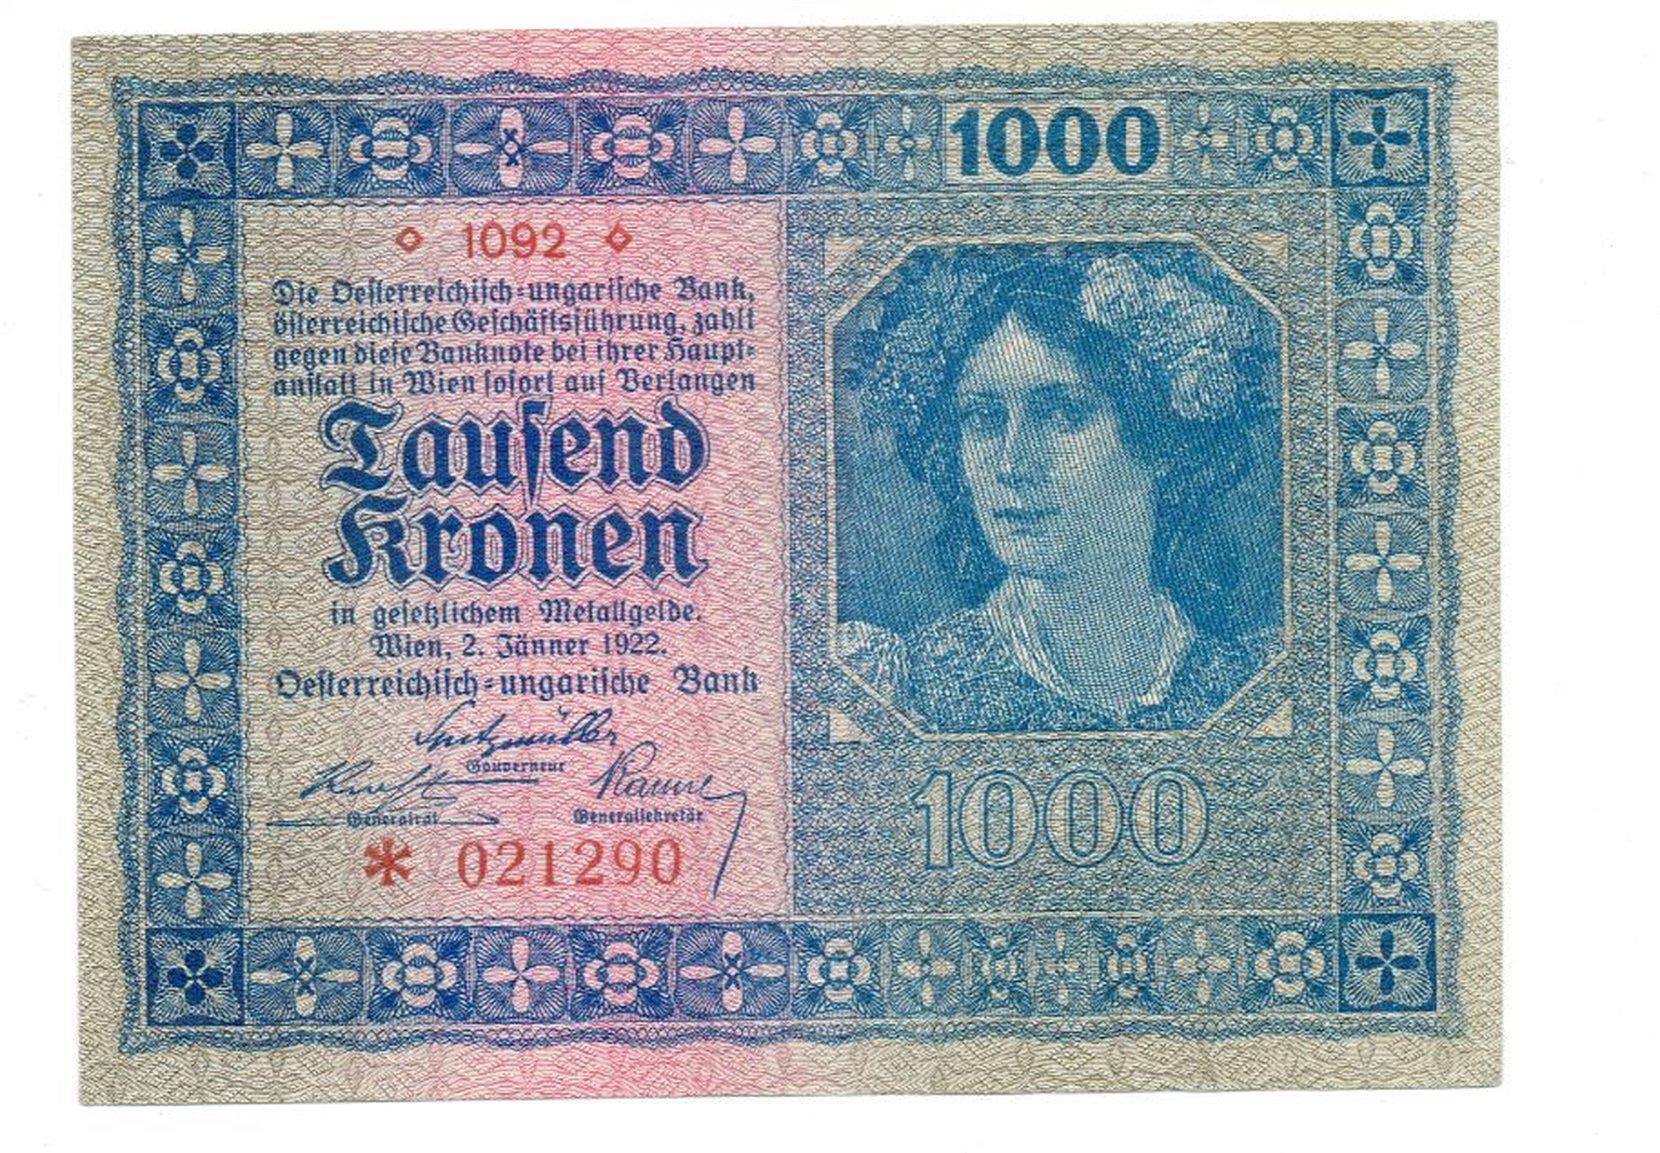 austria - 1000 koron, 1922r. unc- numismatics banknotes